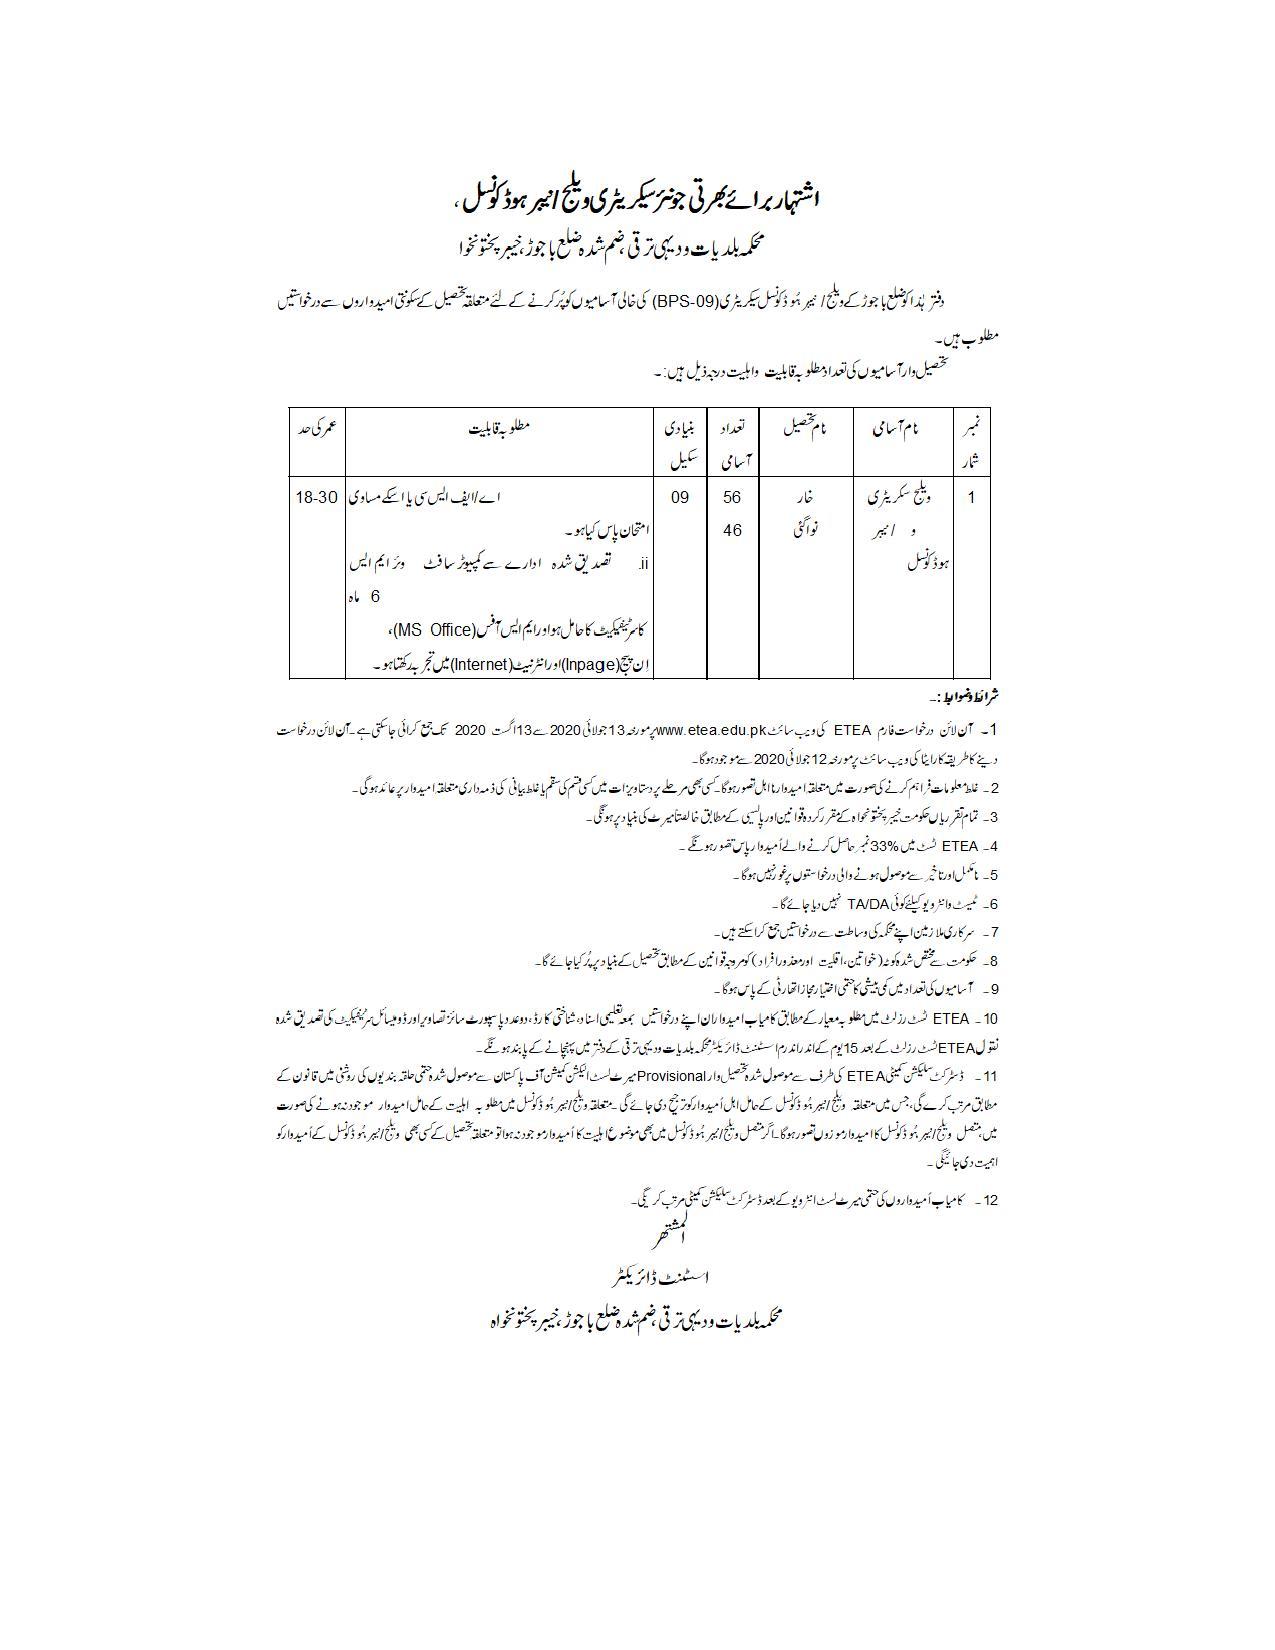 TMA District Orakzai Village secretaries Jobs ETEA Roll Number Slip